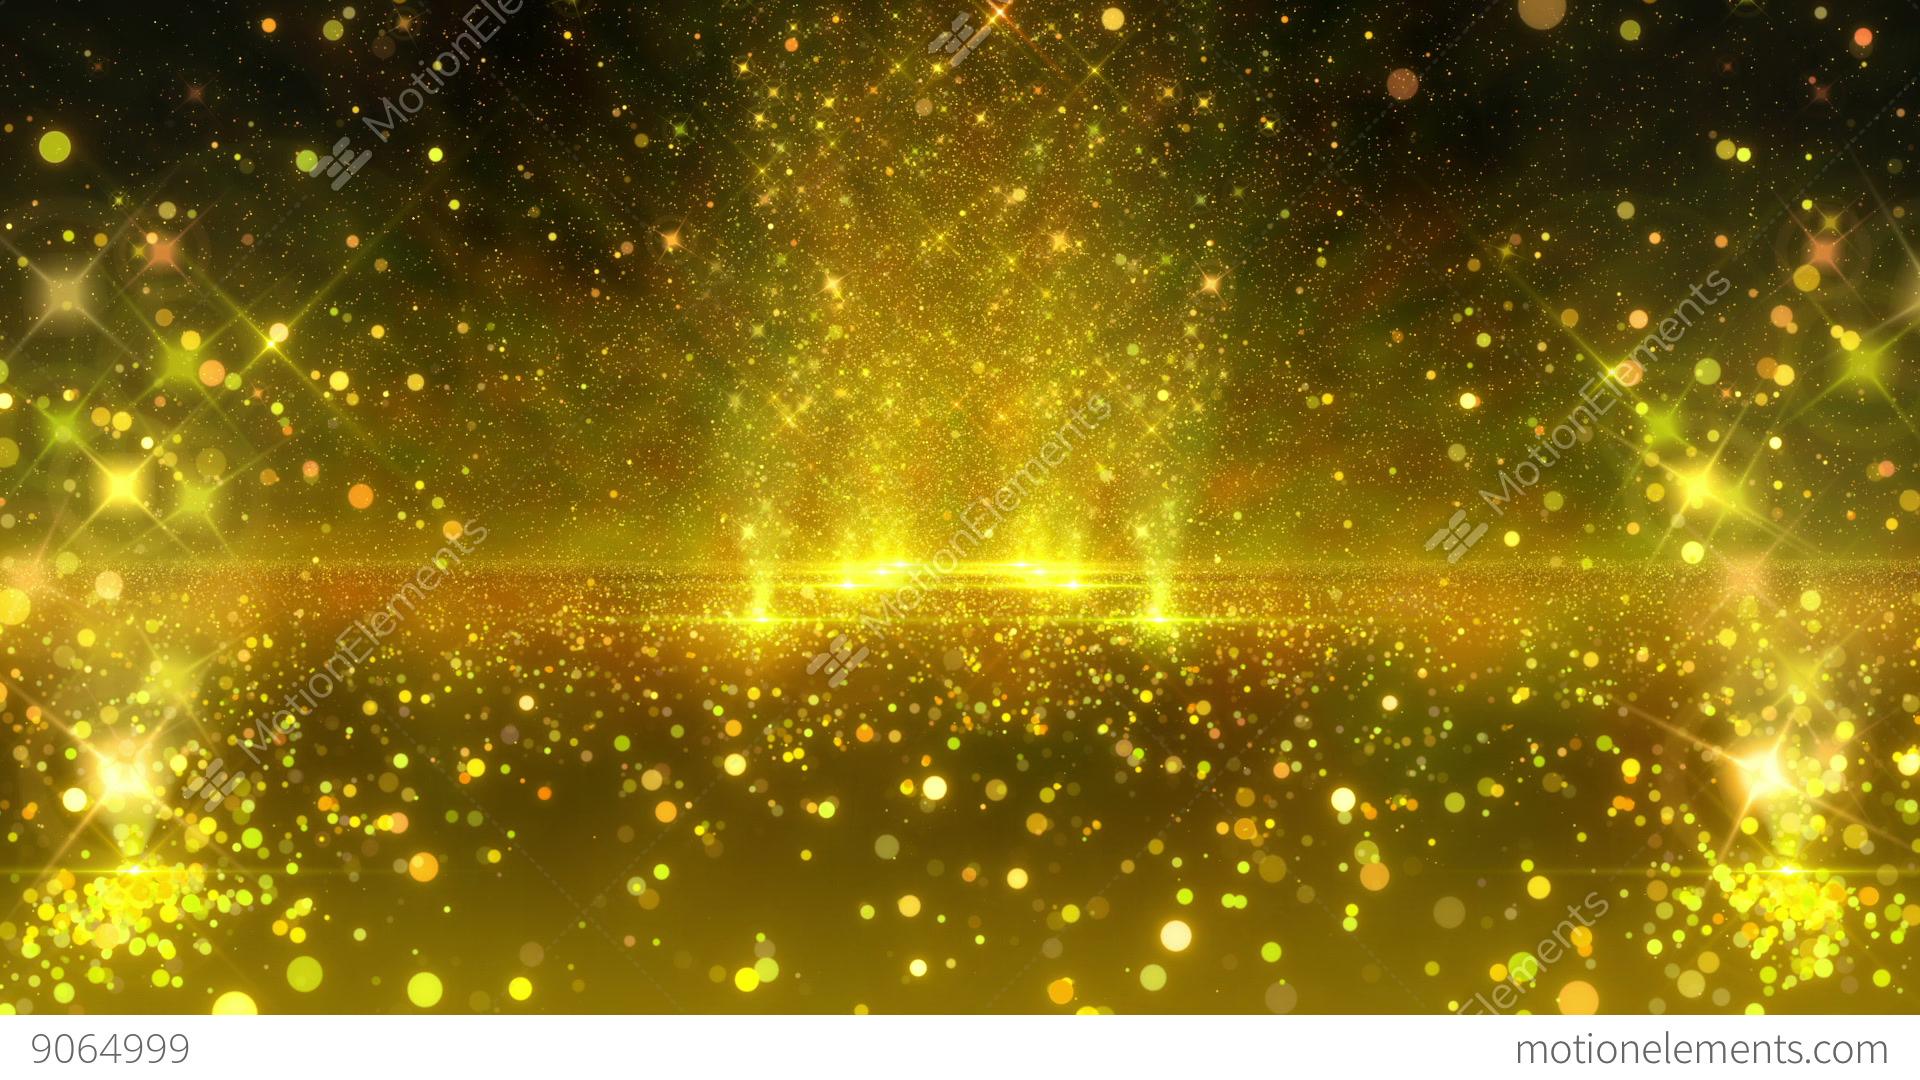 SHA Yellow Kirakira Road Effects Stock Animation | 9064999 for Sun Light Effect Hd  54lyp